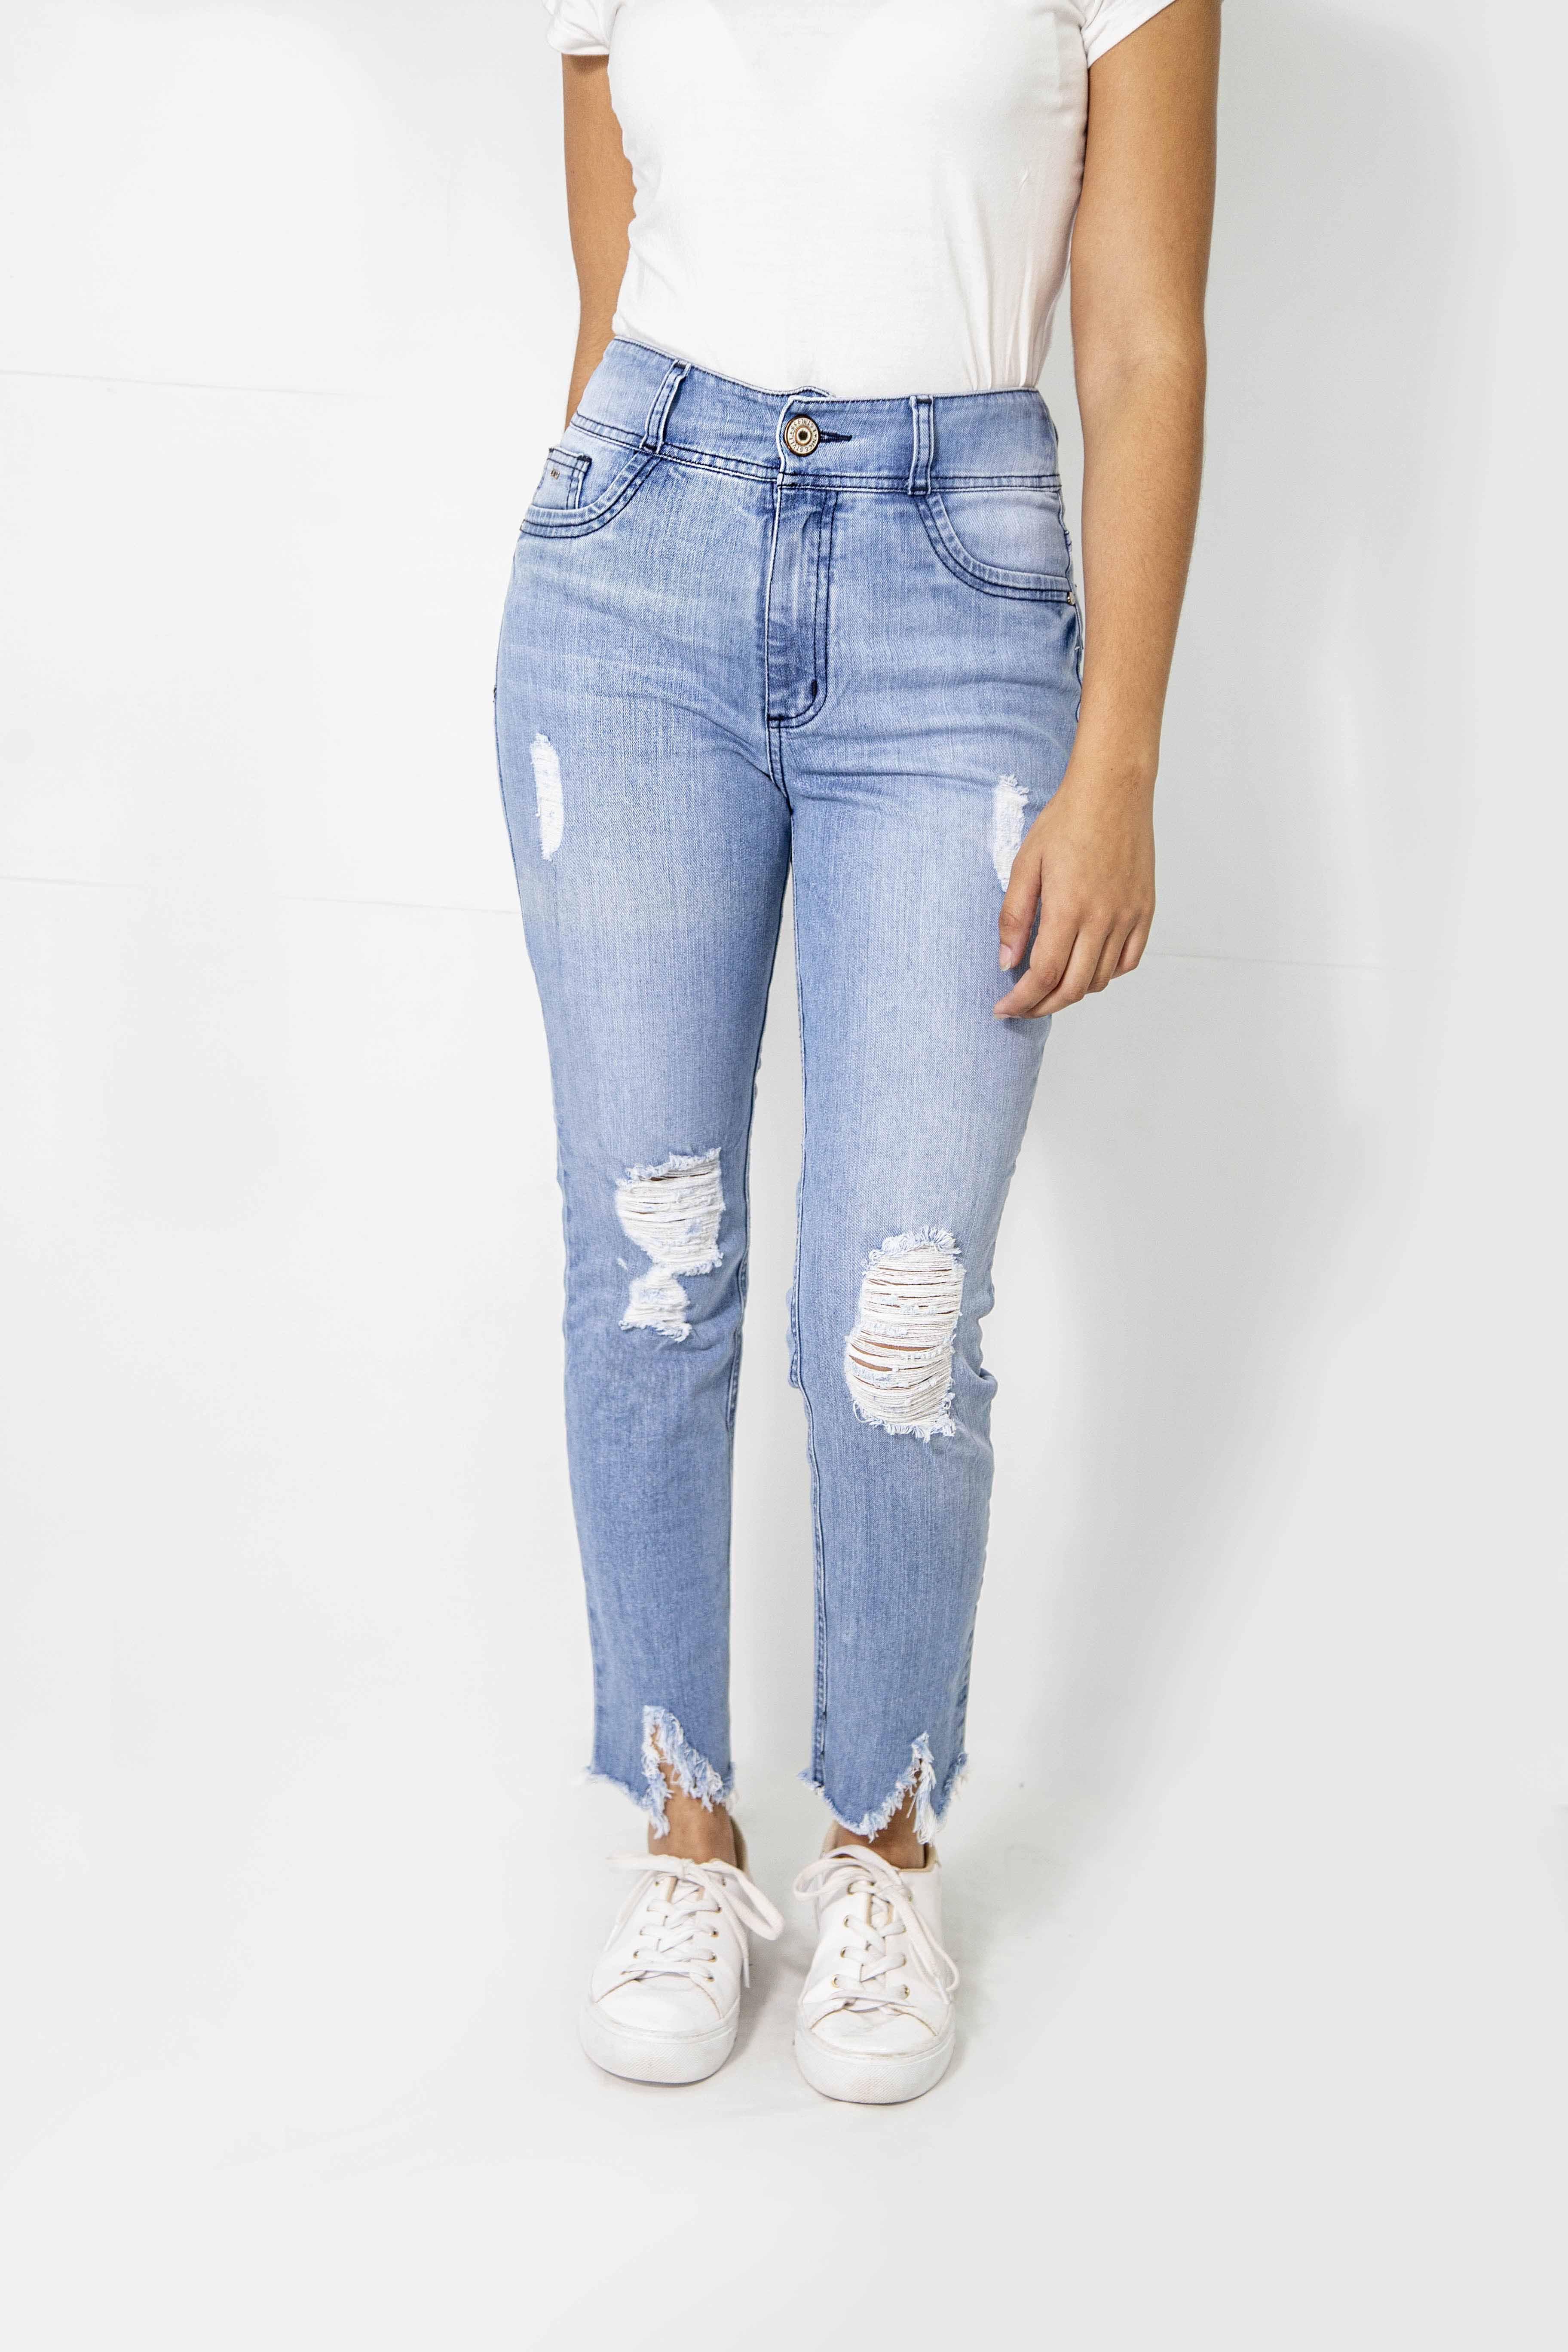 Cropped Dama Jeans Elast. Cod. 1190114